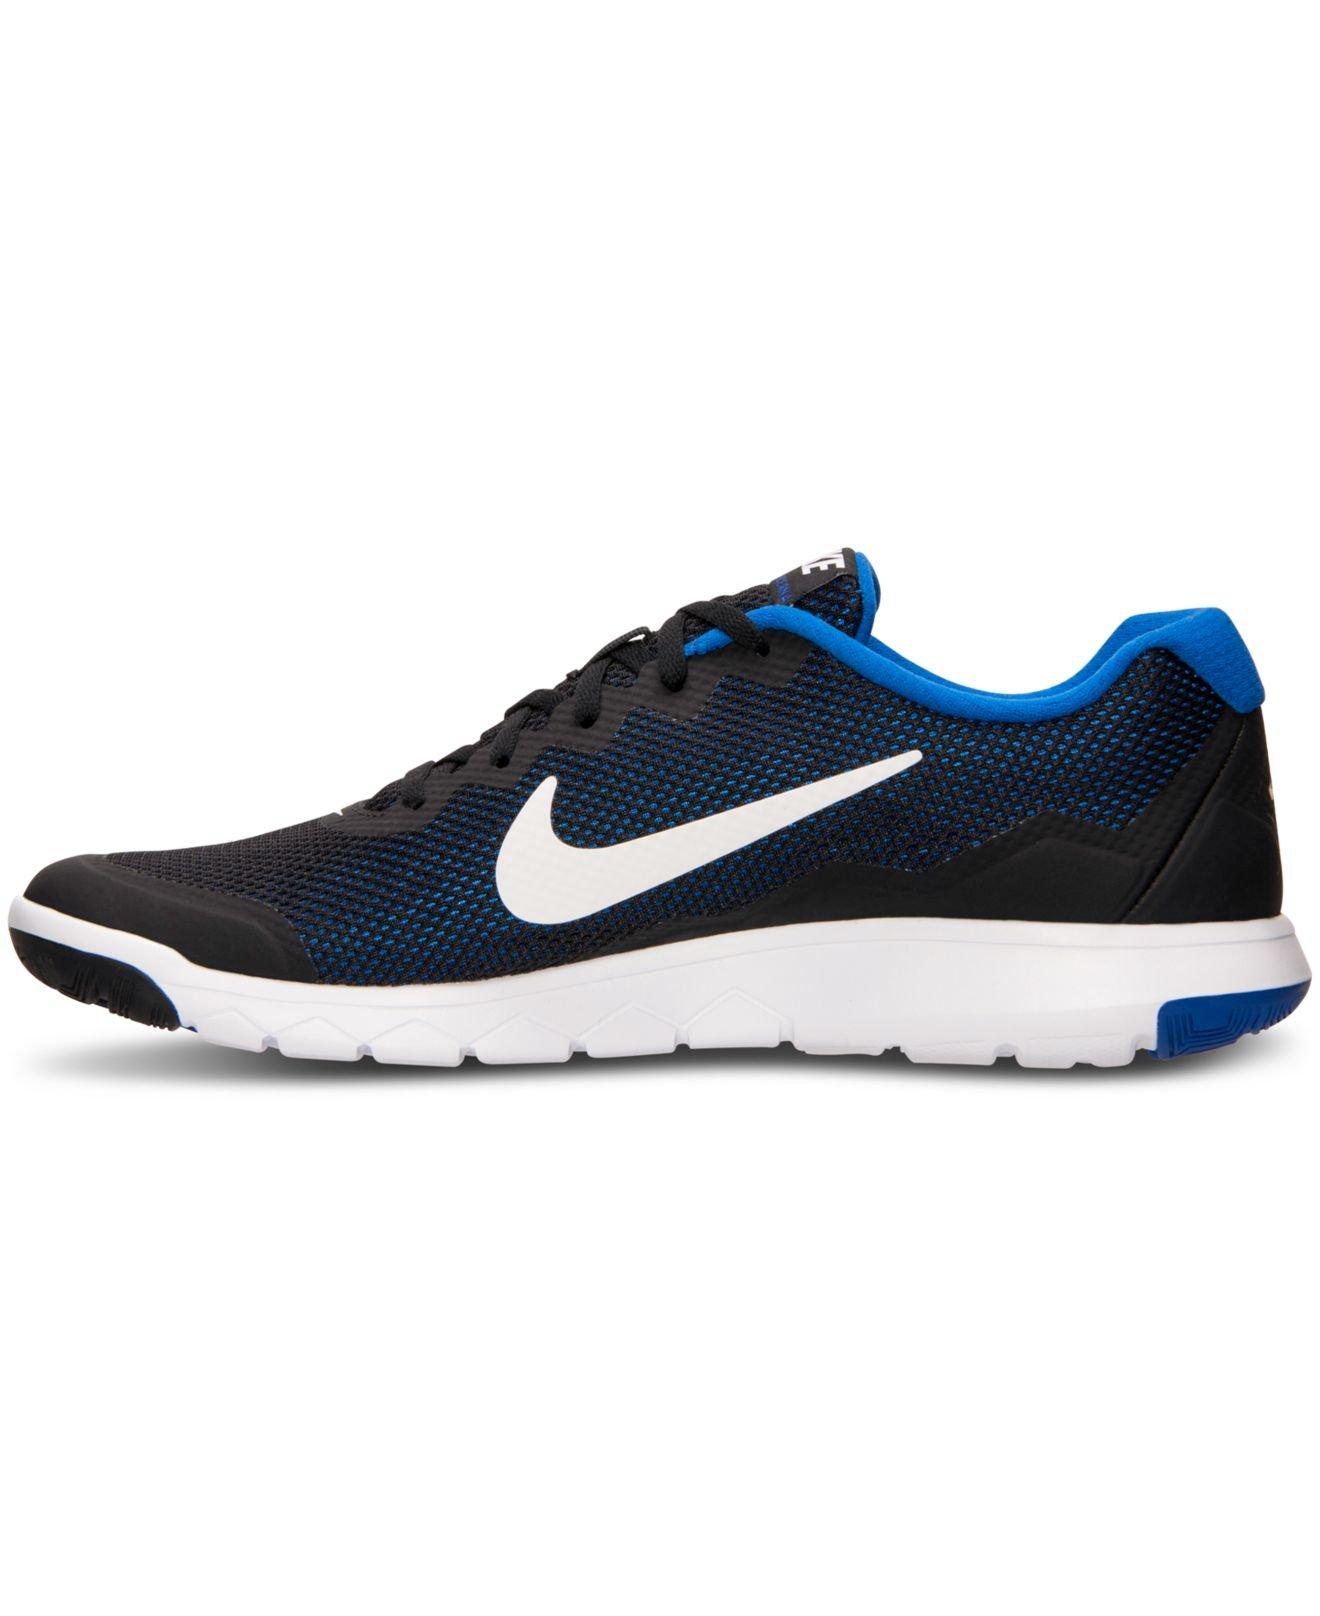 Jordan Running Shoes Finish Line